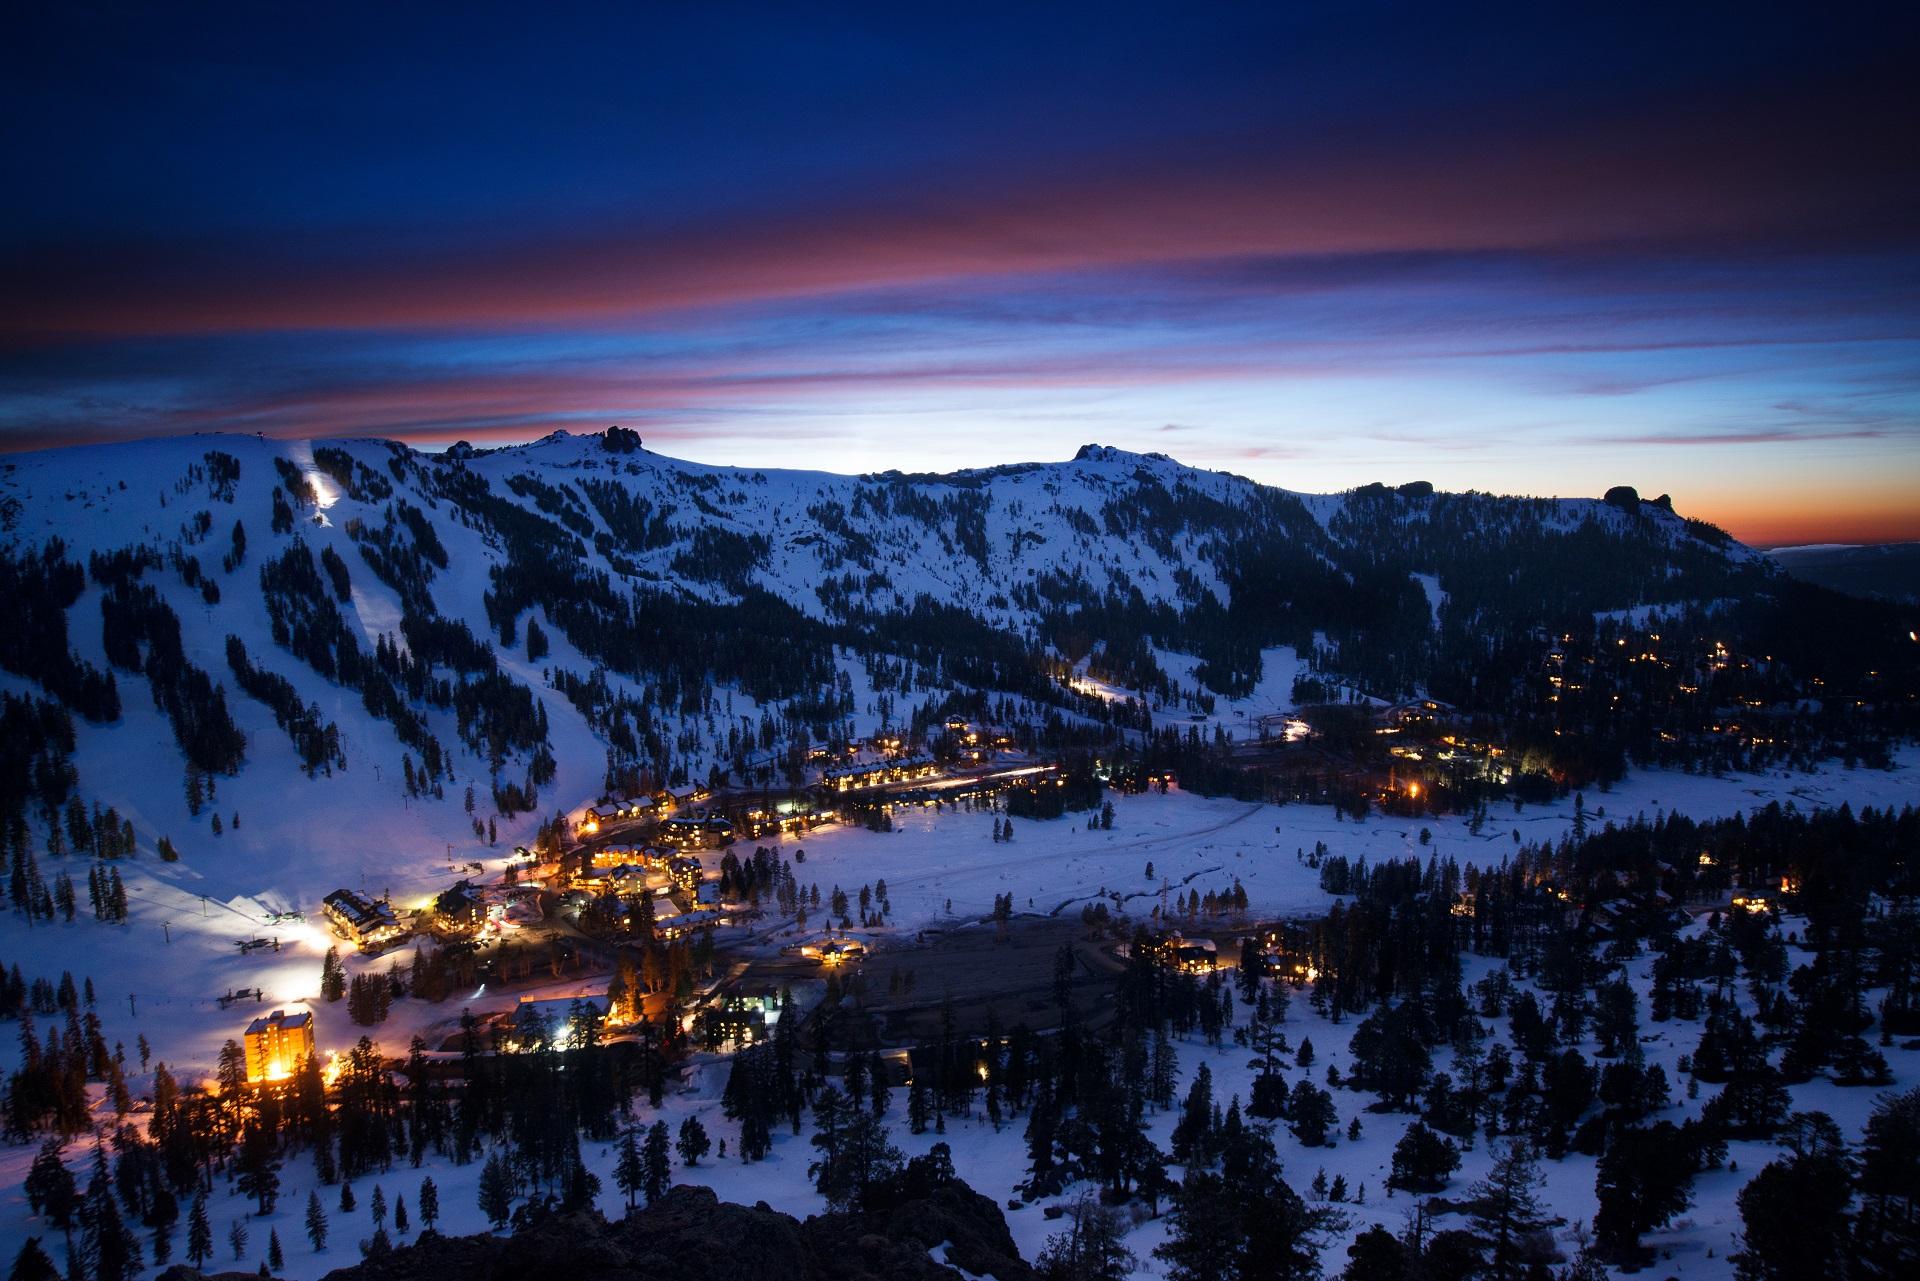 kirkwood deals | kirkwood lodging and ski packages | skisync